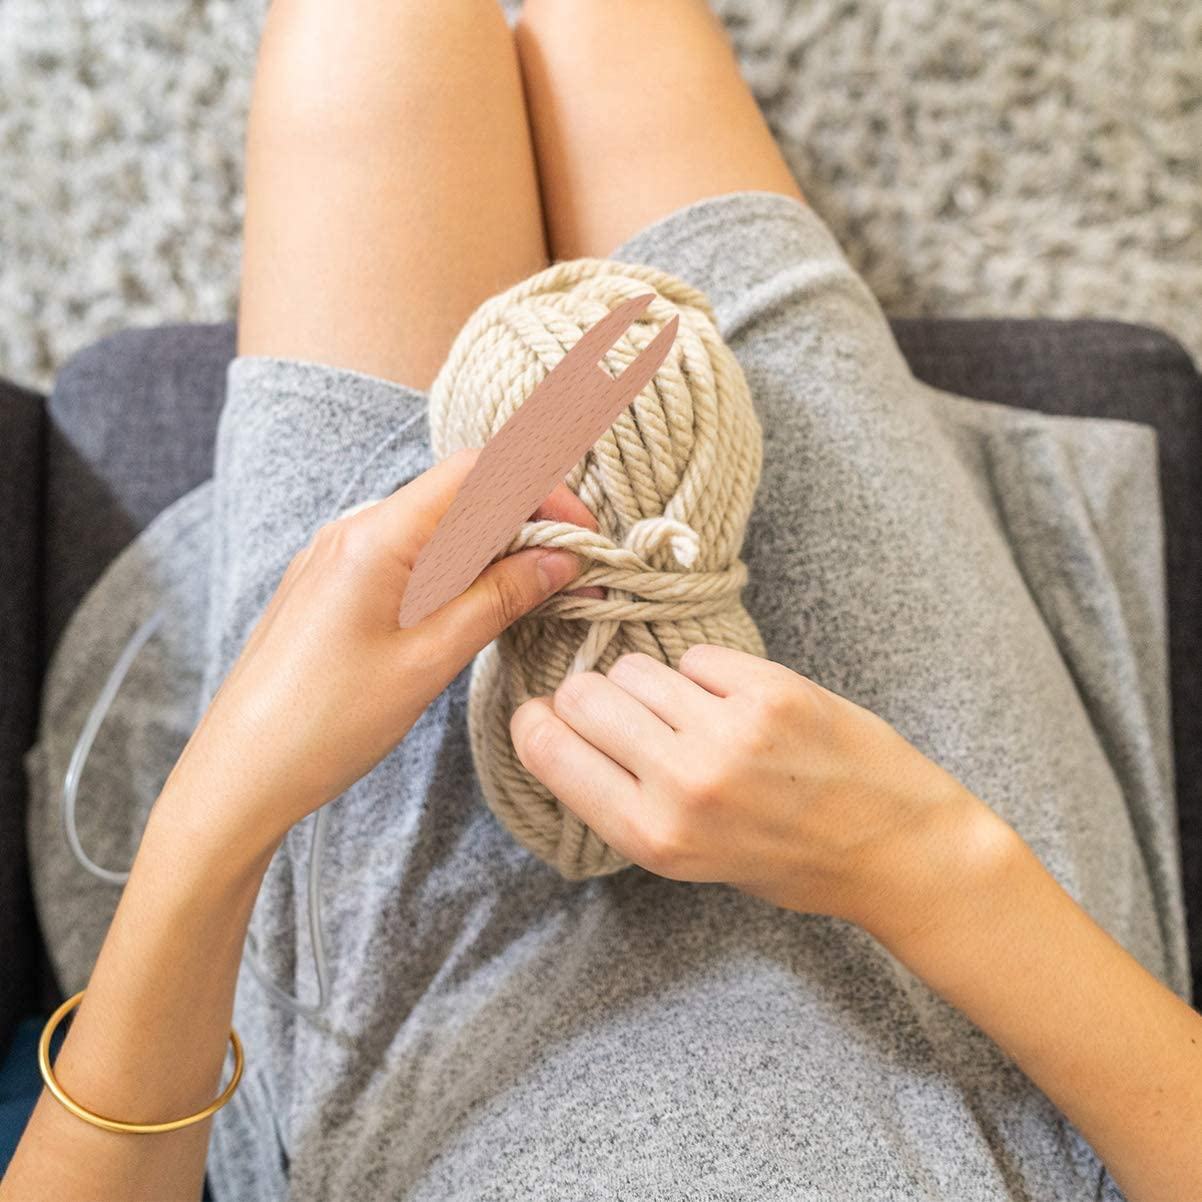 ARTIBETTER Weaving Shuttle DIY Wooden Knitting Stick Sweater Tapestry Wooden Shutter Tool for Handicrafts Small Size